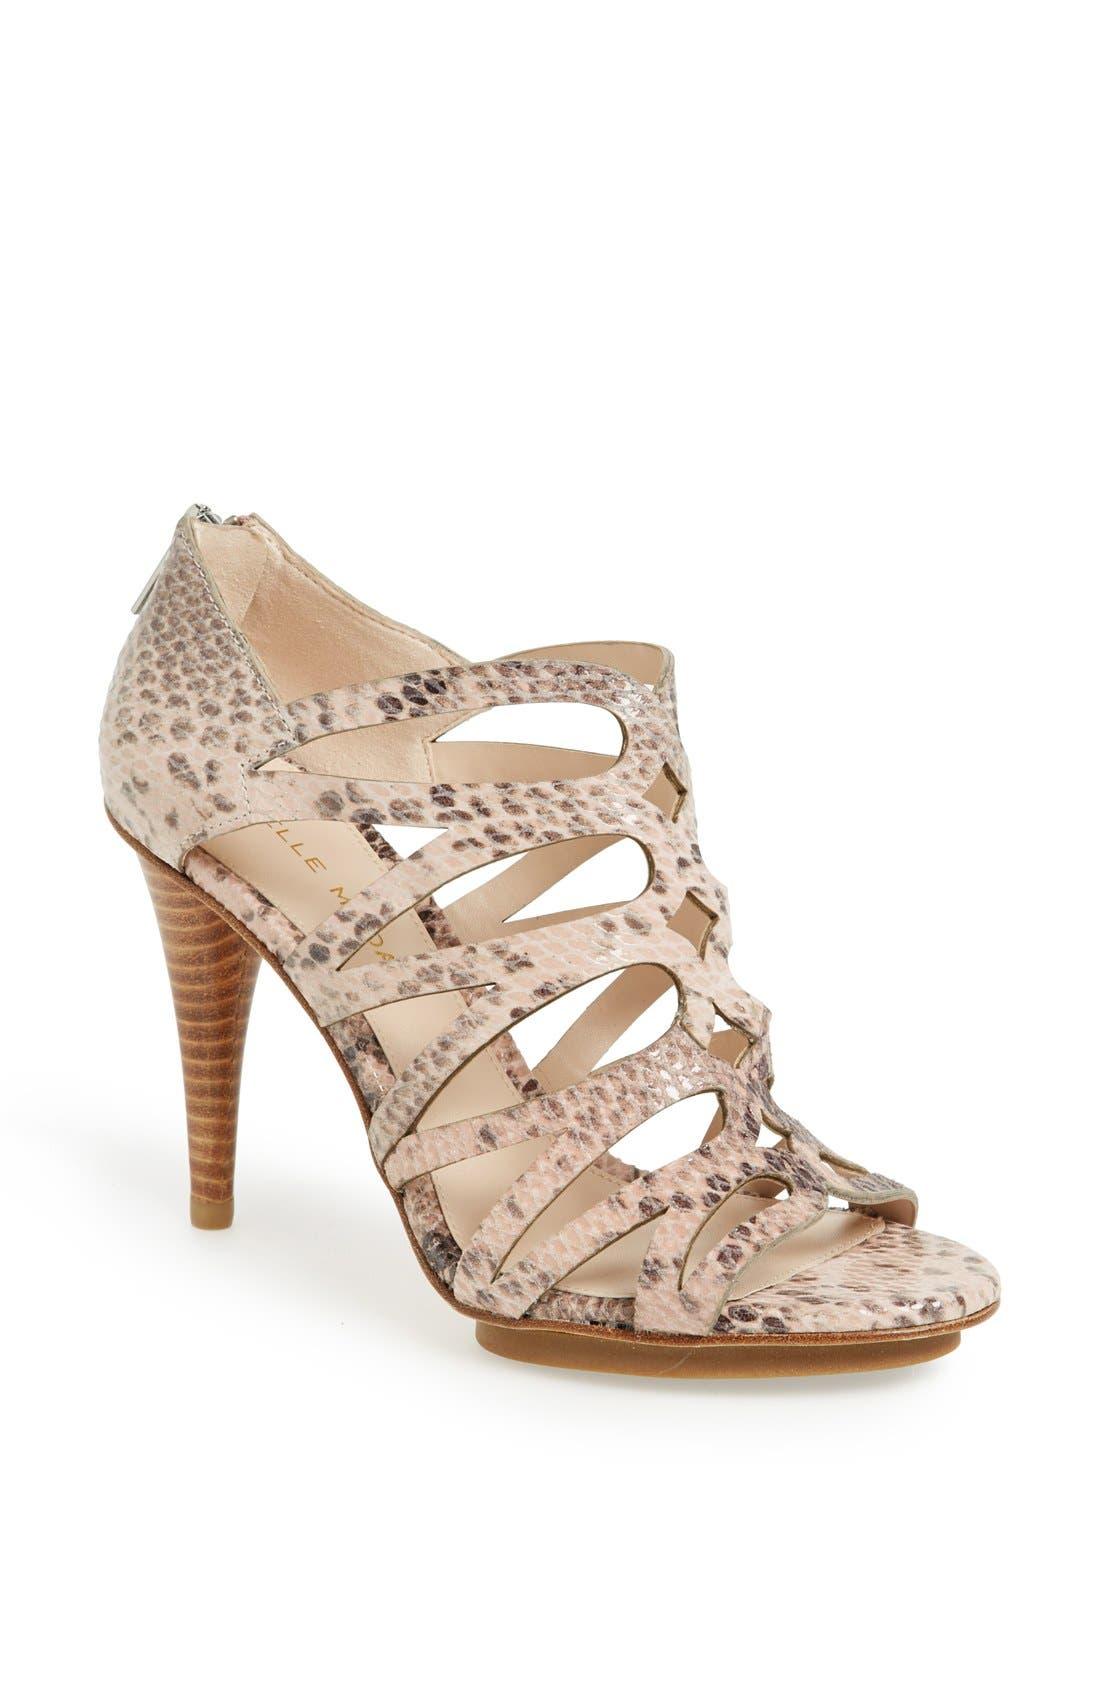 Alternate Image 1 Selected - Pelle Moda 'Robyn' Leather Sandal